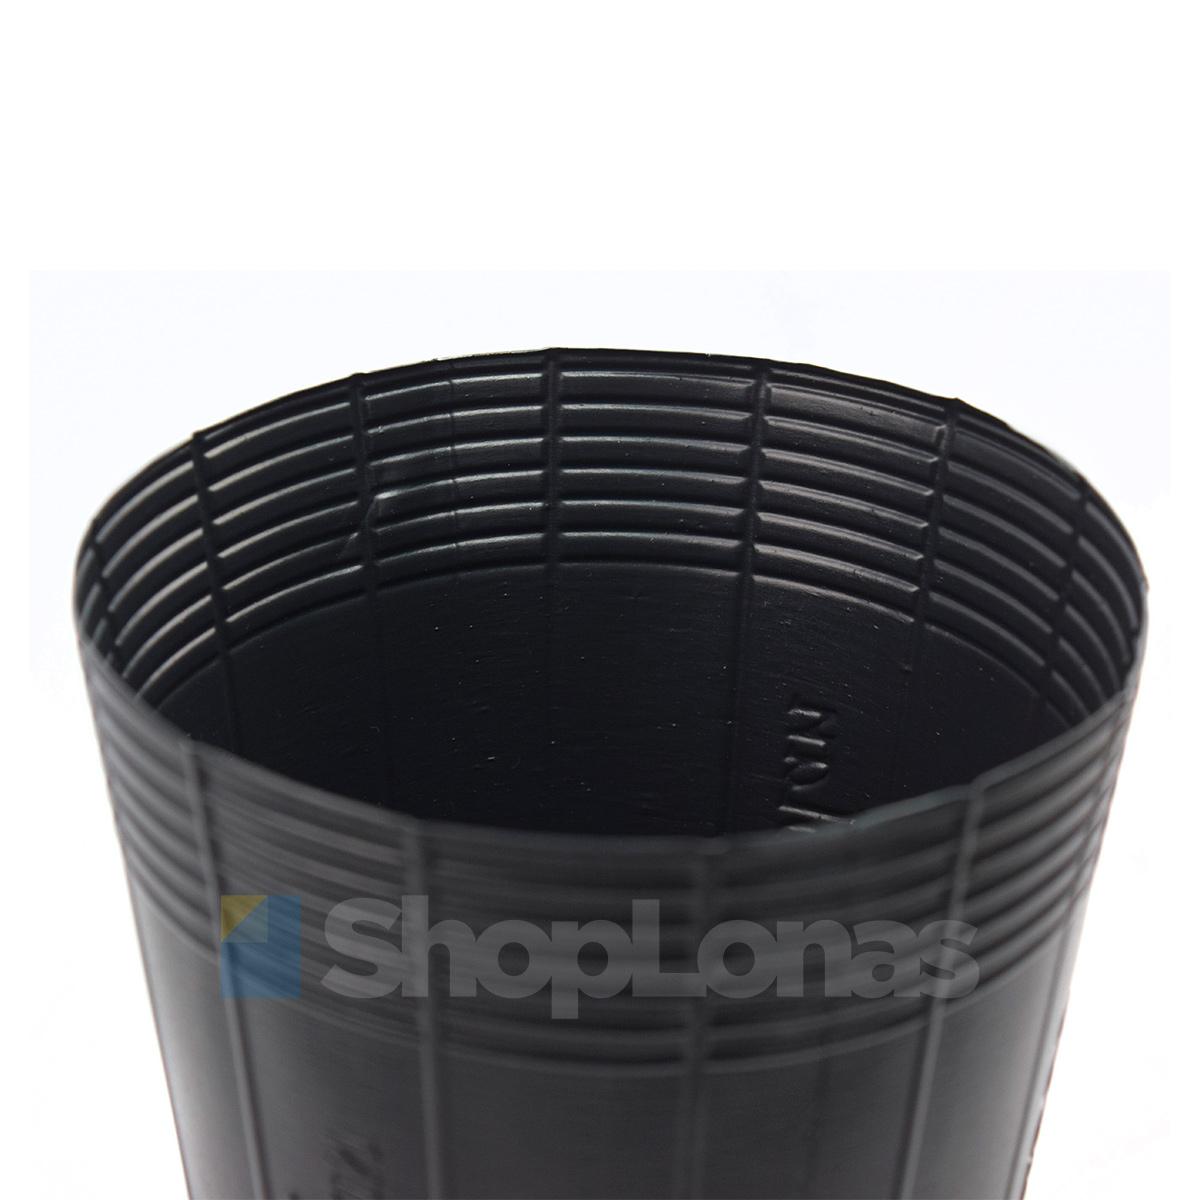 Kit com 45 Embalagem Vaso para Plantas e Mudas Nutriplan 3,8L